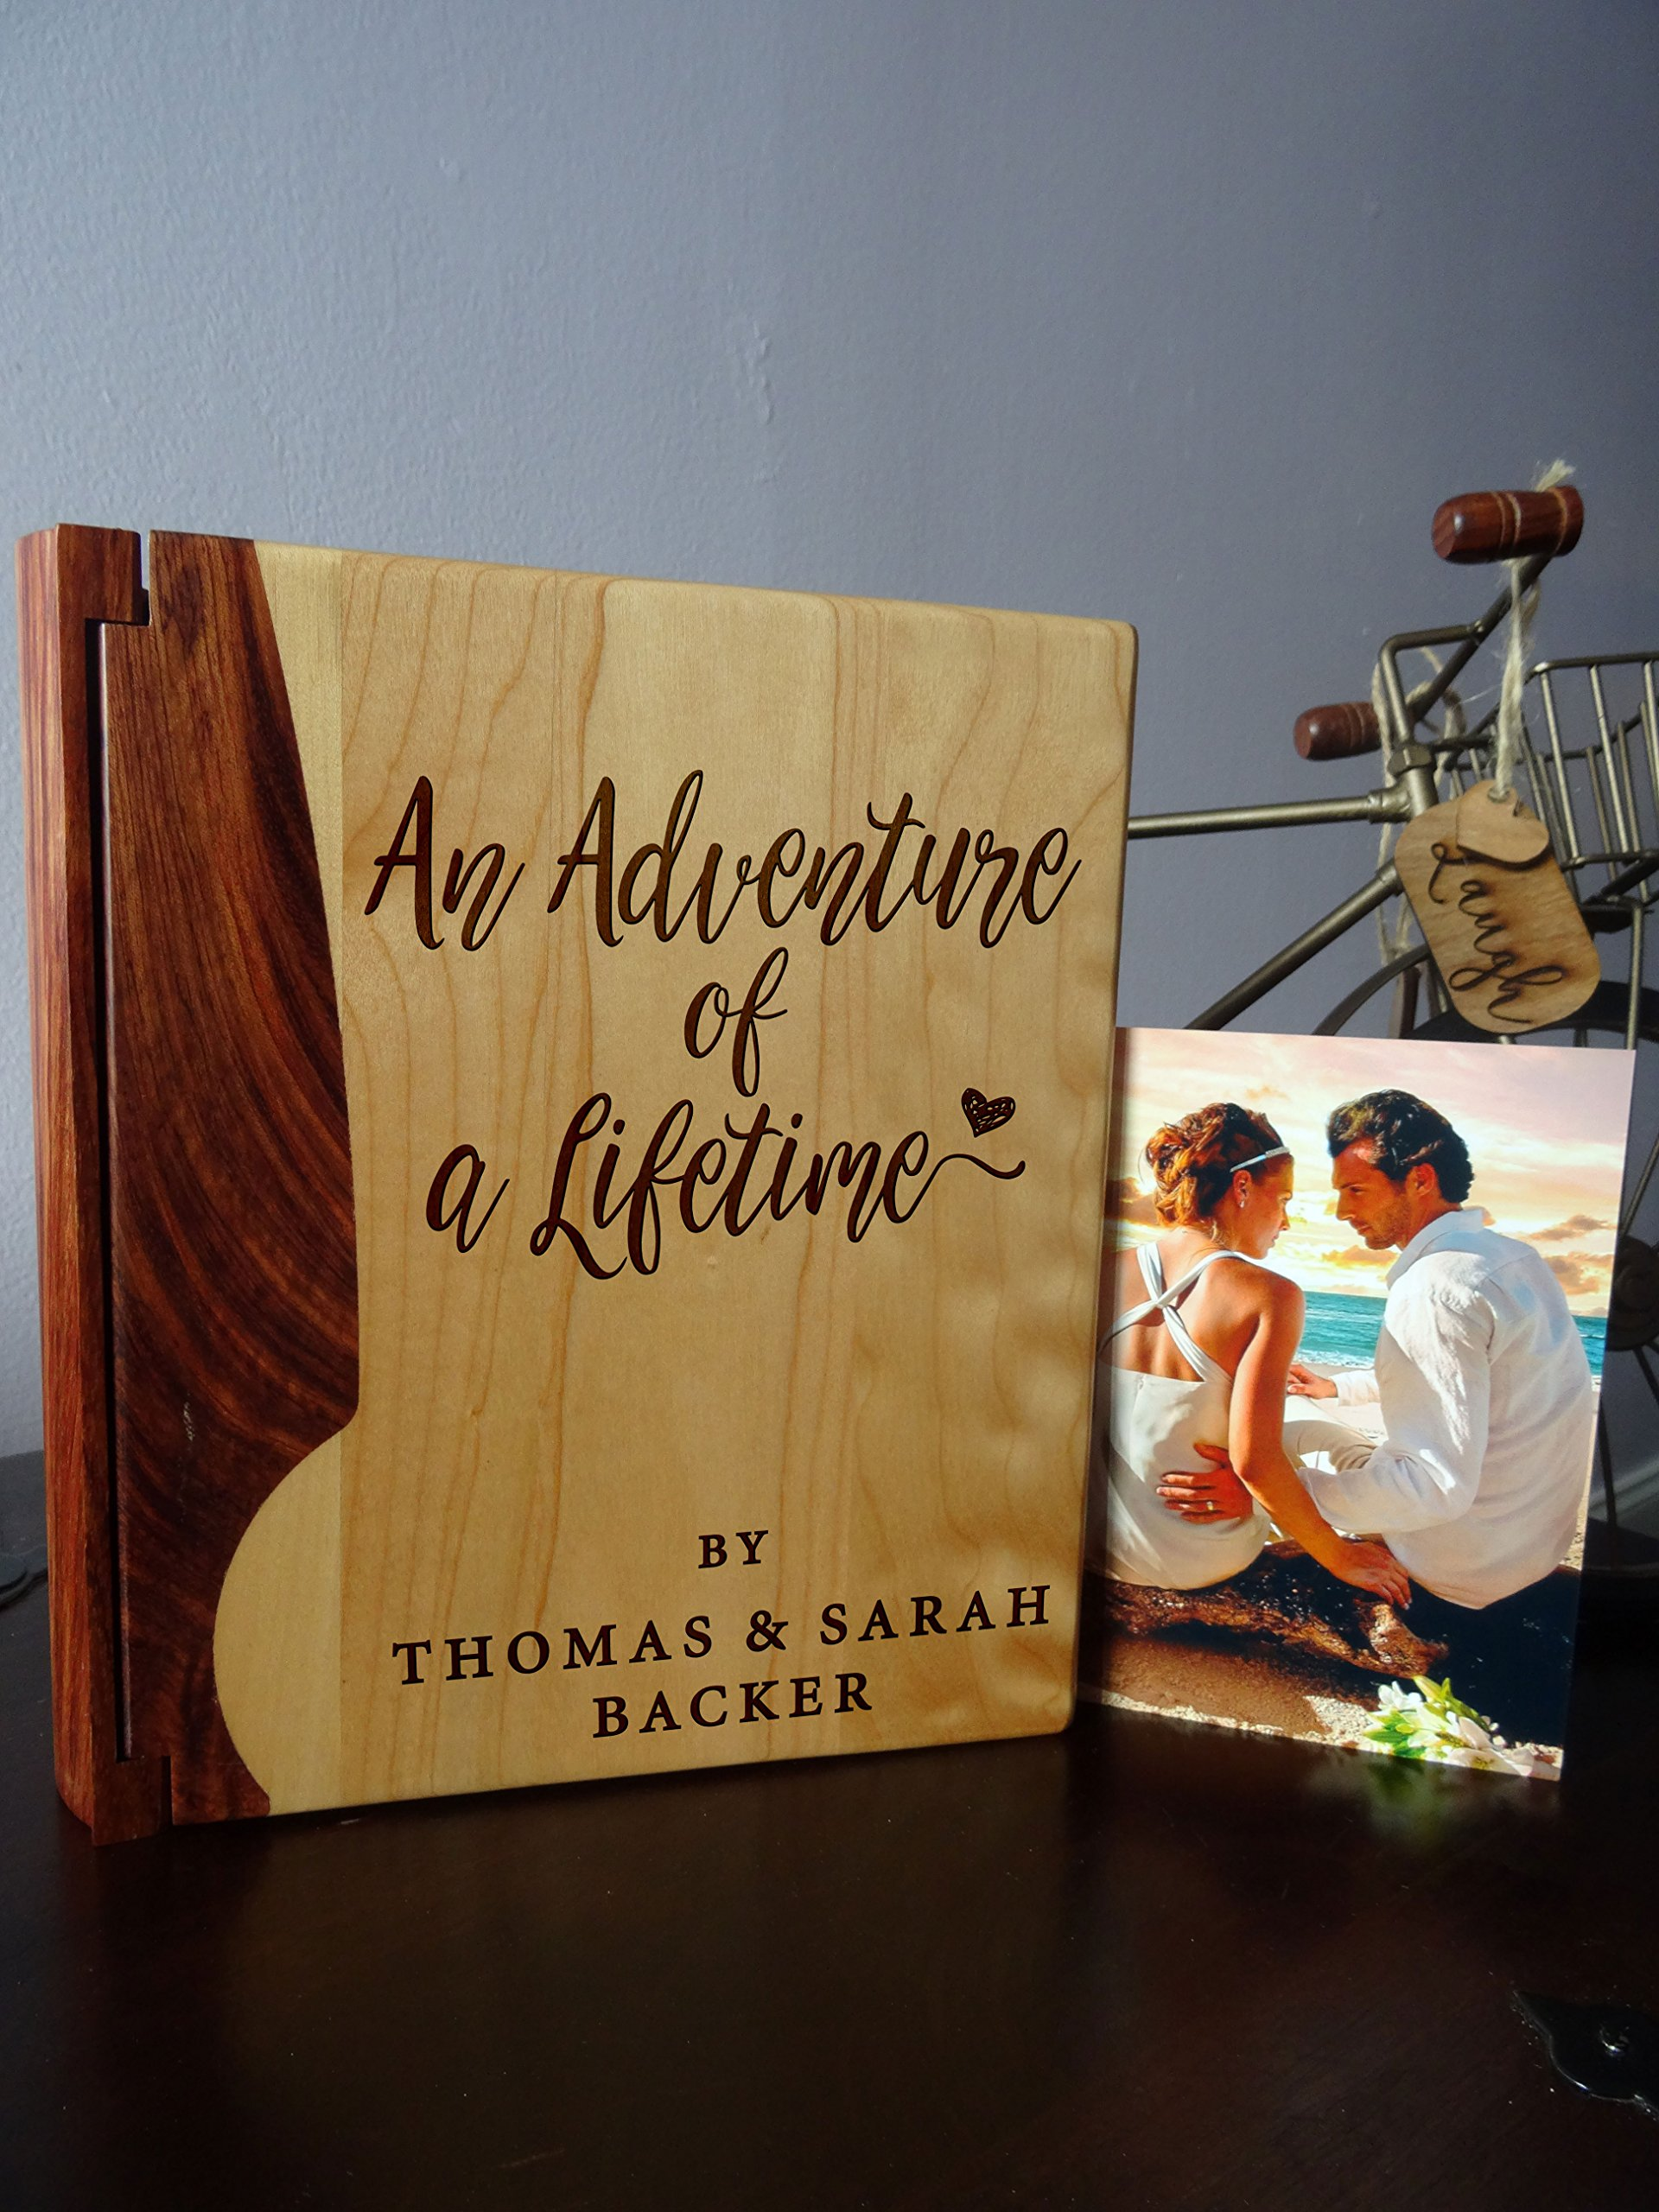 Personalized Wood Cover Photo Album, Custom Engraved Wedding Album, Style 109 (Maple & Walnut Cover) by LoveToCreateStamps (Image #1)